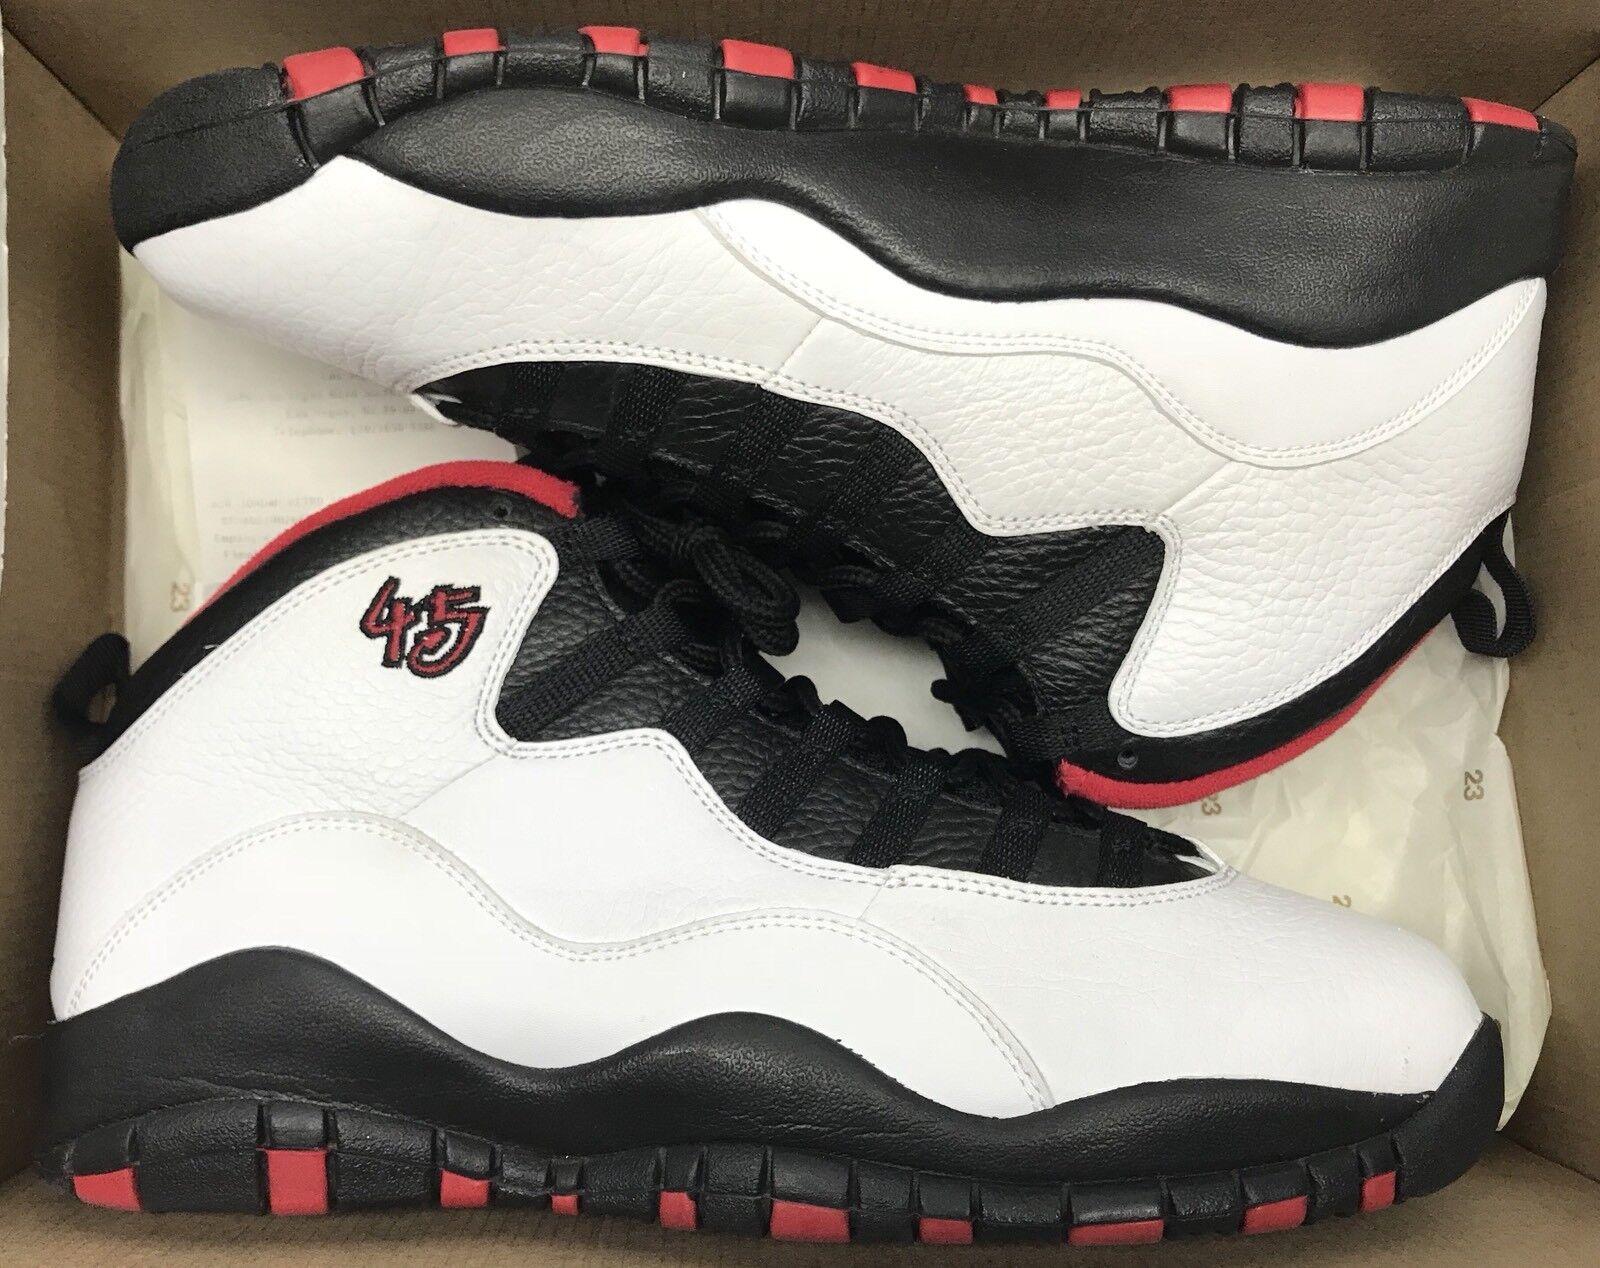 Jordan Retro X Double Nickel White Red Black Chicago 310805-102 Sz 10